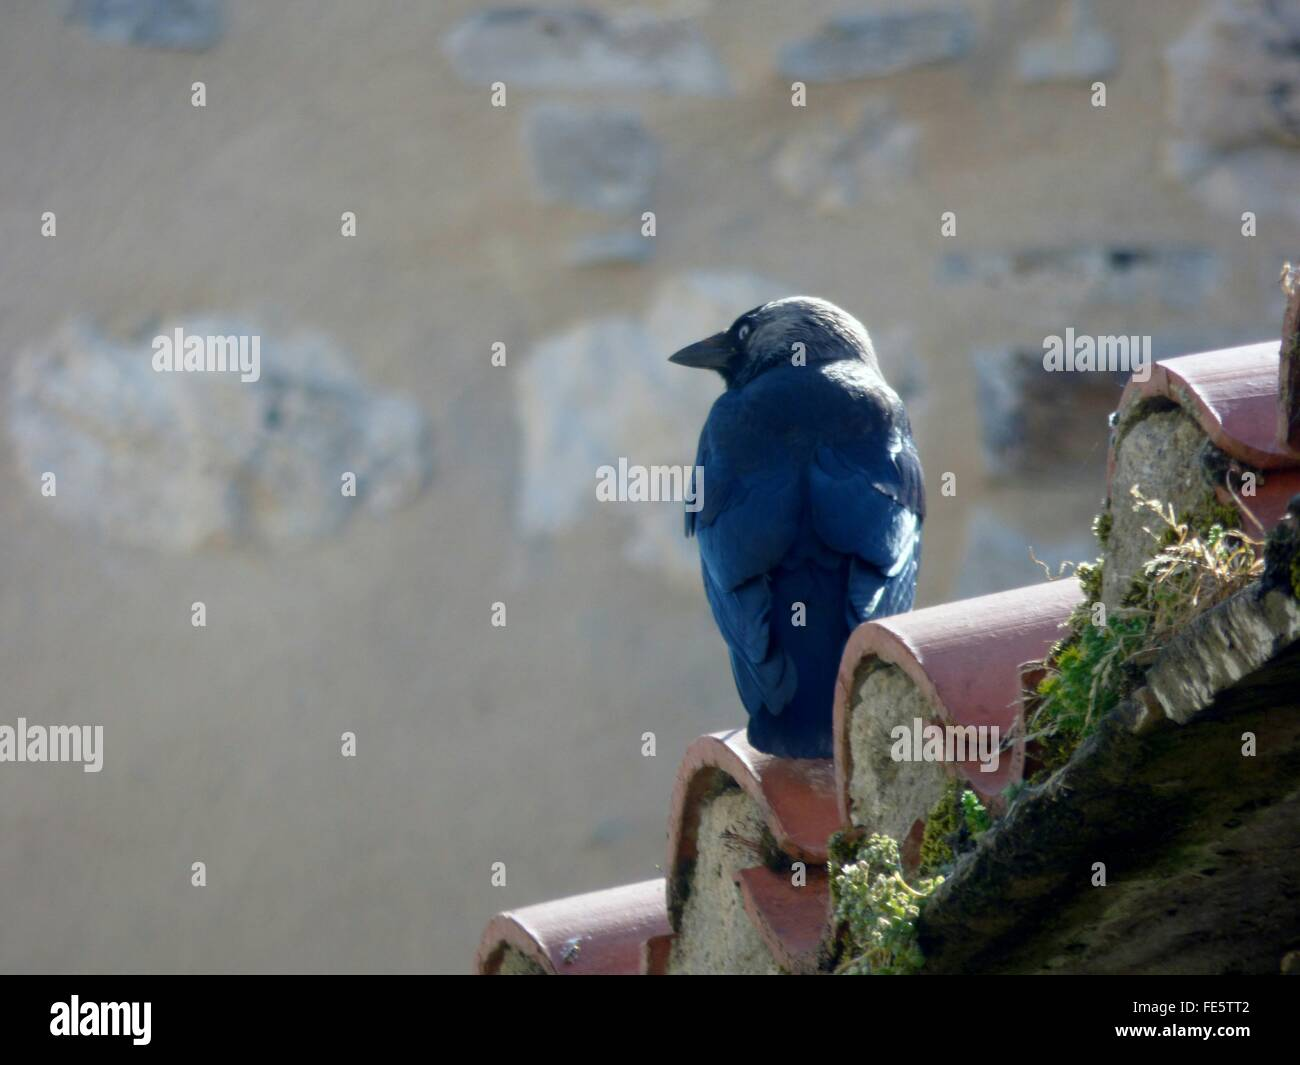 Australian Raven On Roof Against Wall - Stock Image